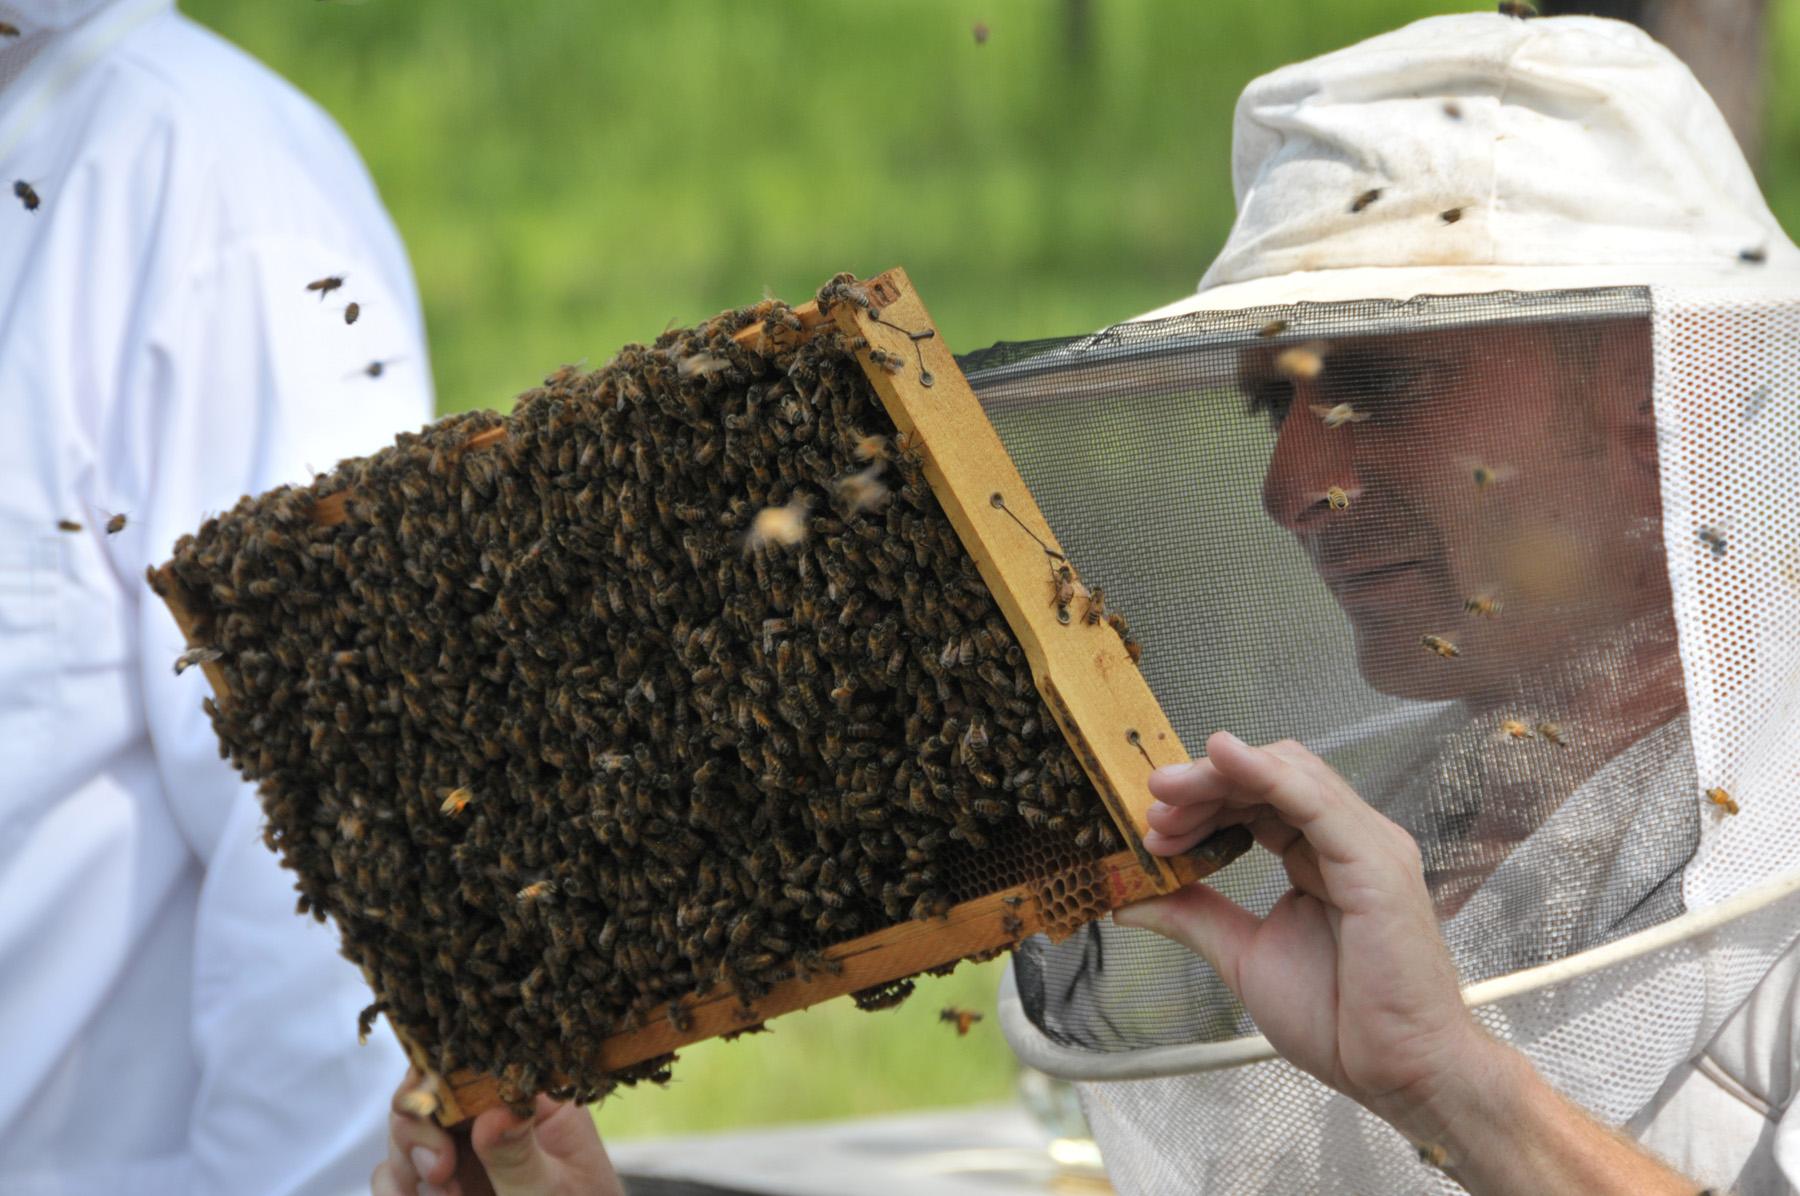 https://fdacsdpi.files.wordpress.com/2011/08/inmate-beekeeper-training-2.jpg